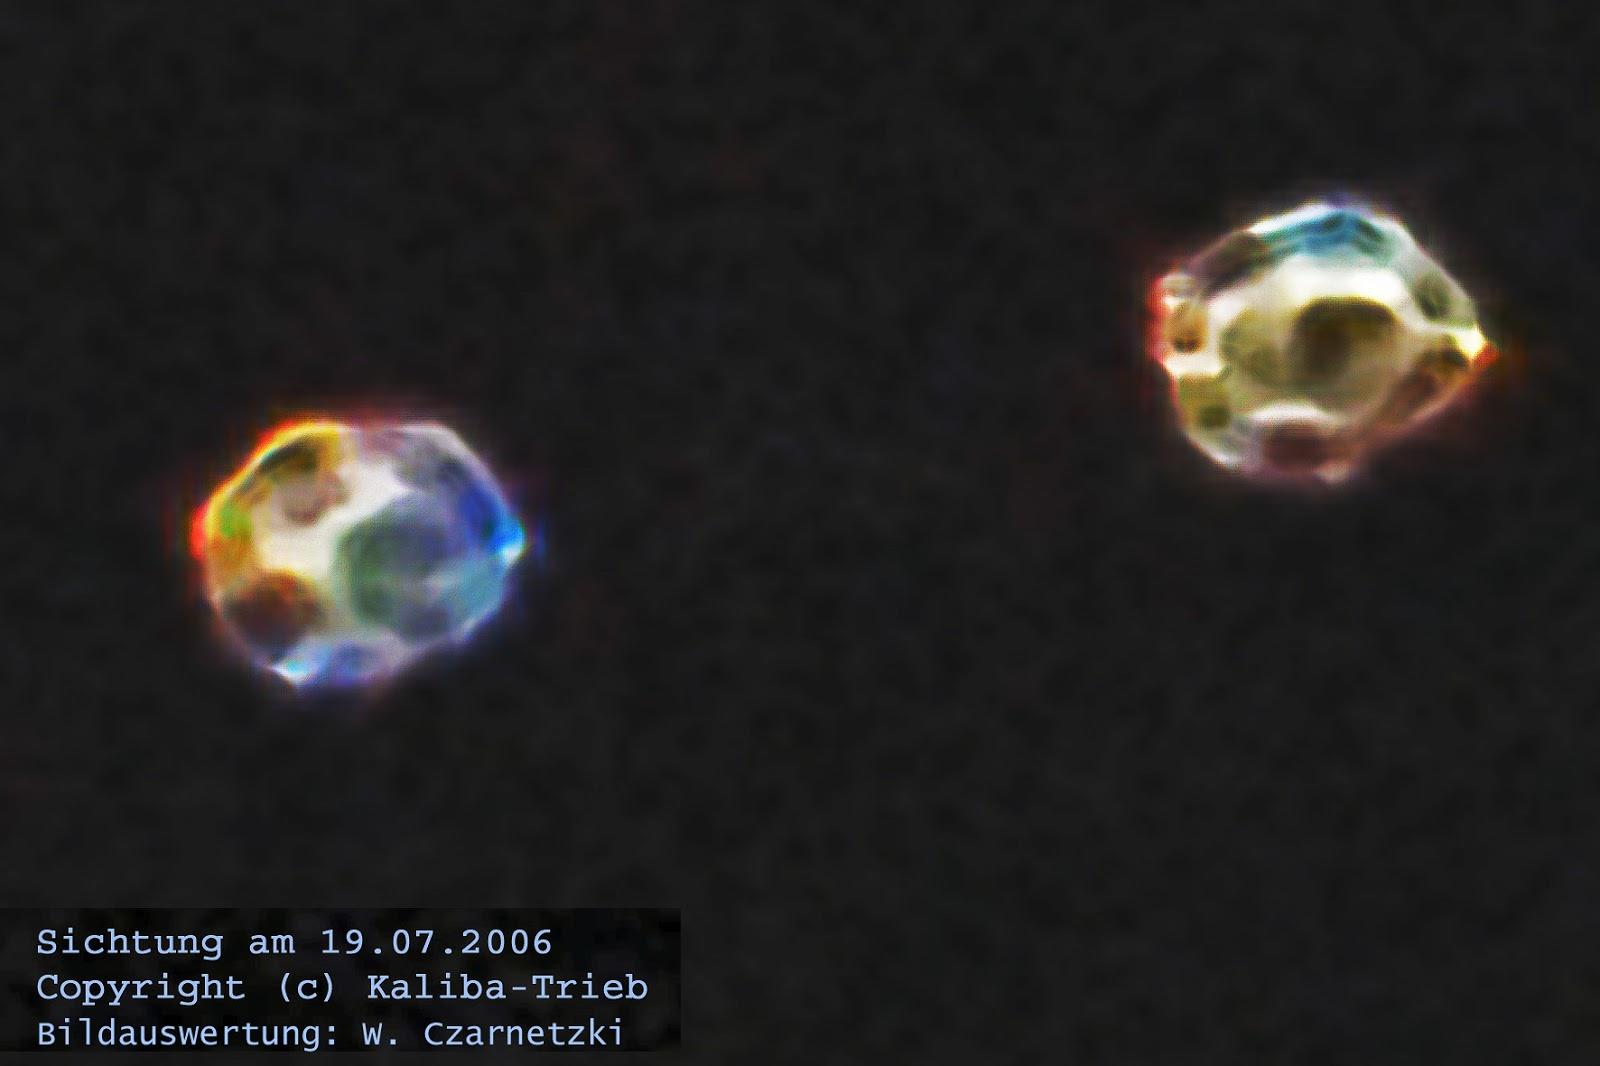 knittelfeld_ufo_190706.jpg%2B%2528fot2%2